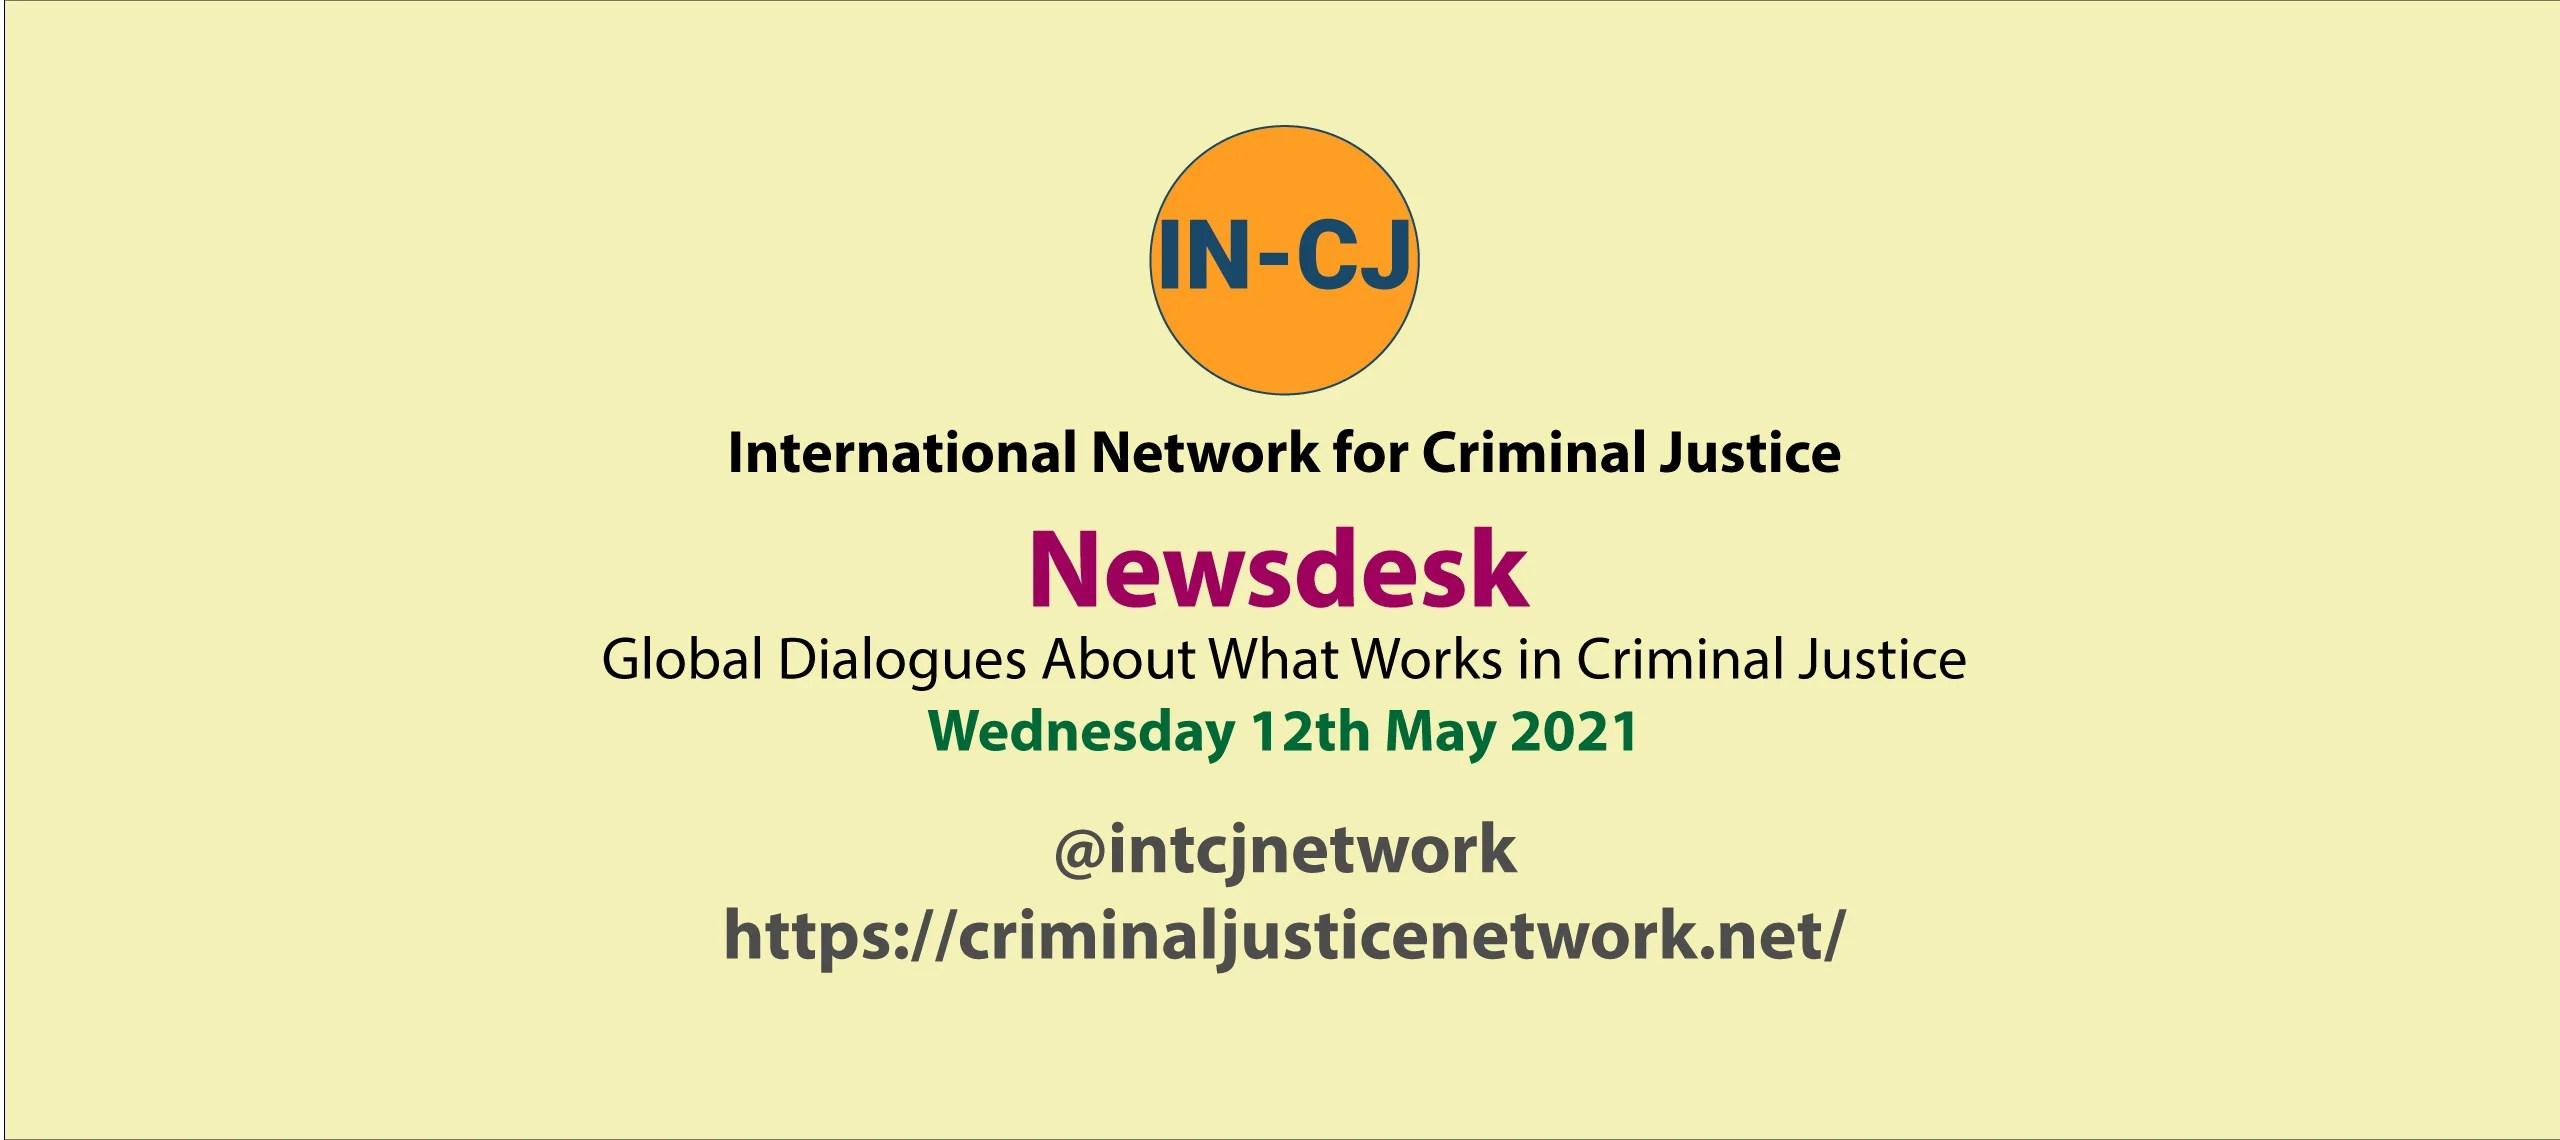 IN-CJ Global Dialogues Newsdesk 12th May